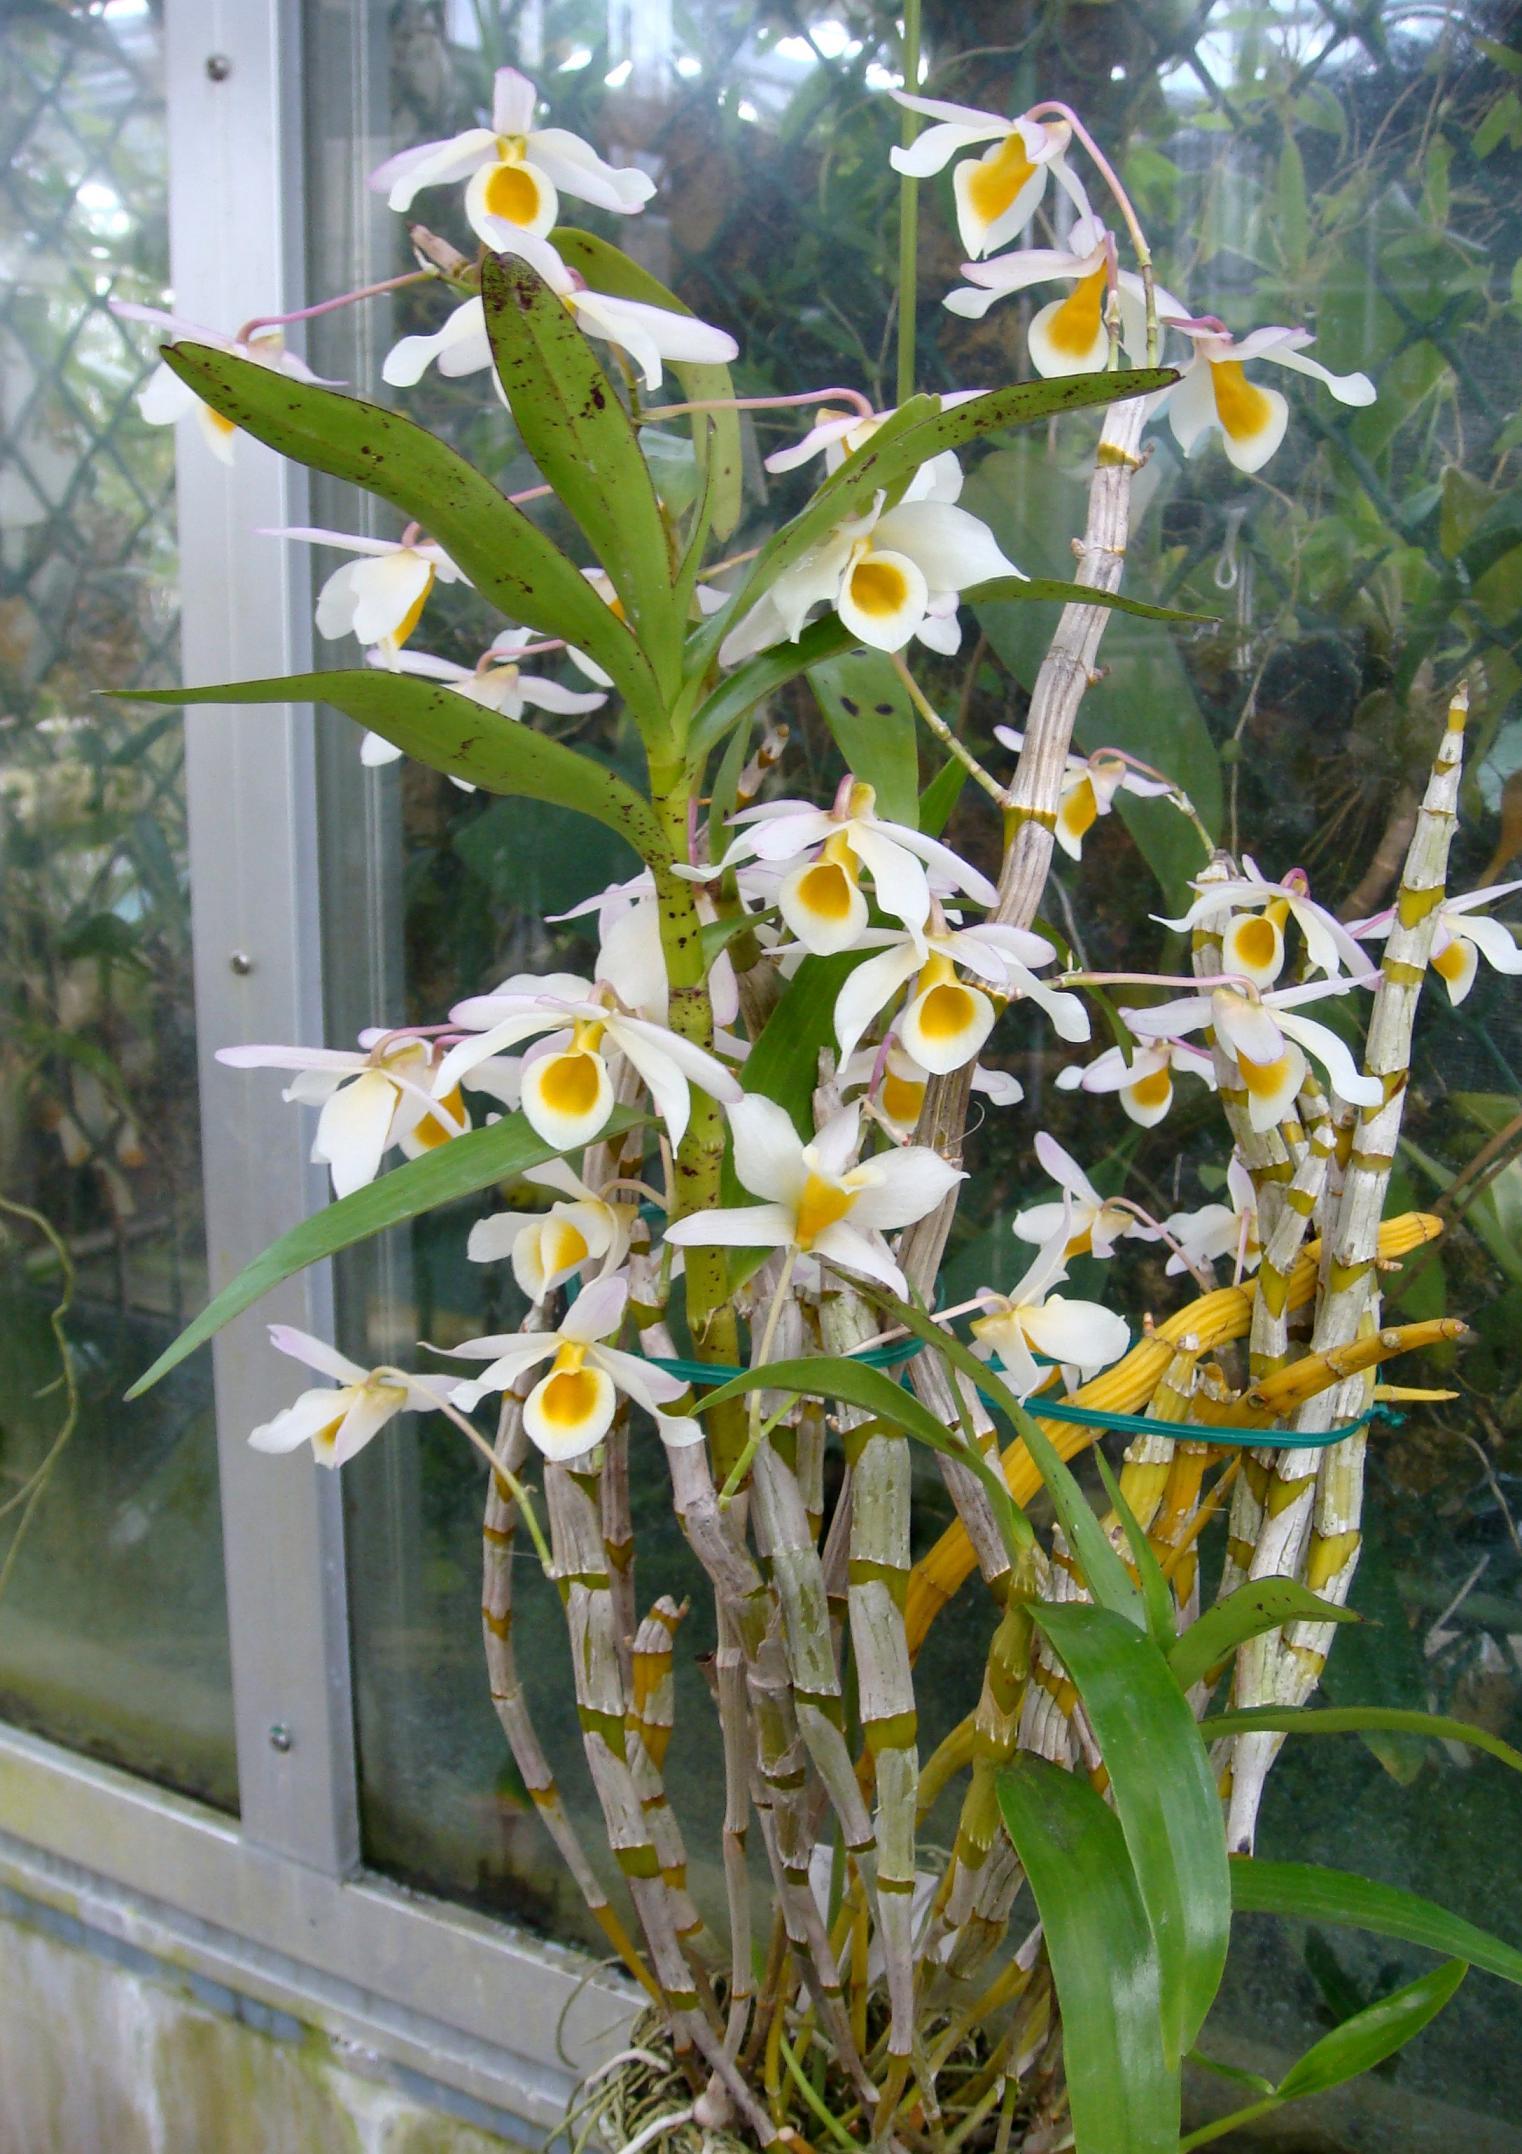 http://orchids.la.coocan.jp/Dendrobium/Dendrobium%20signatum/DSC08582.JPG